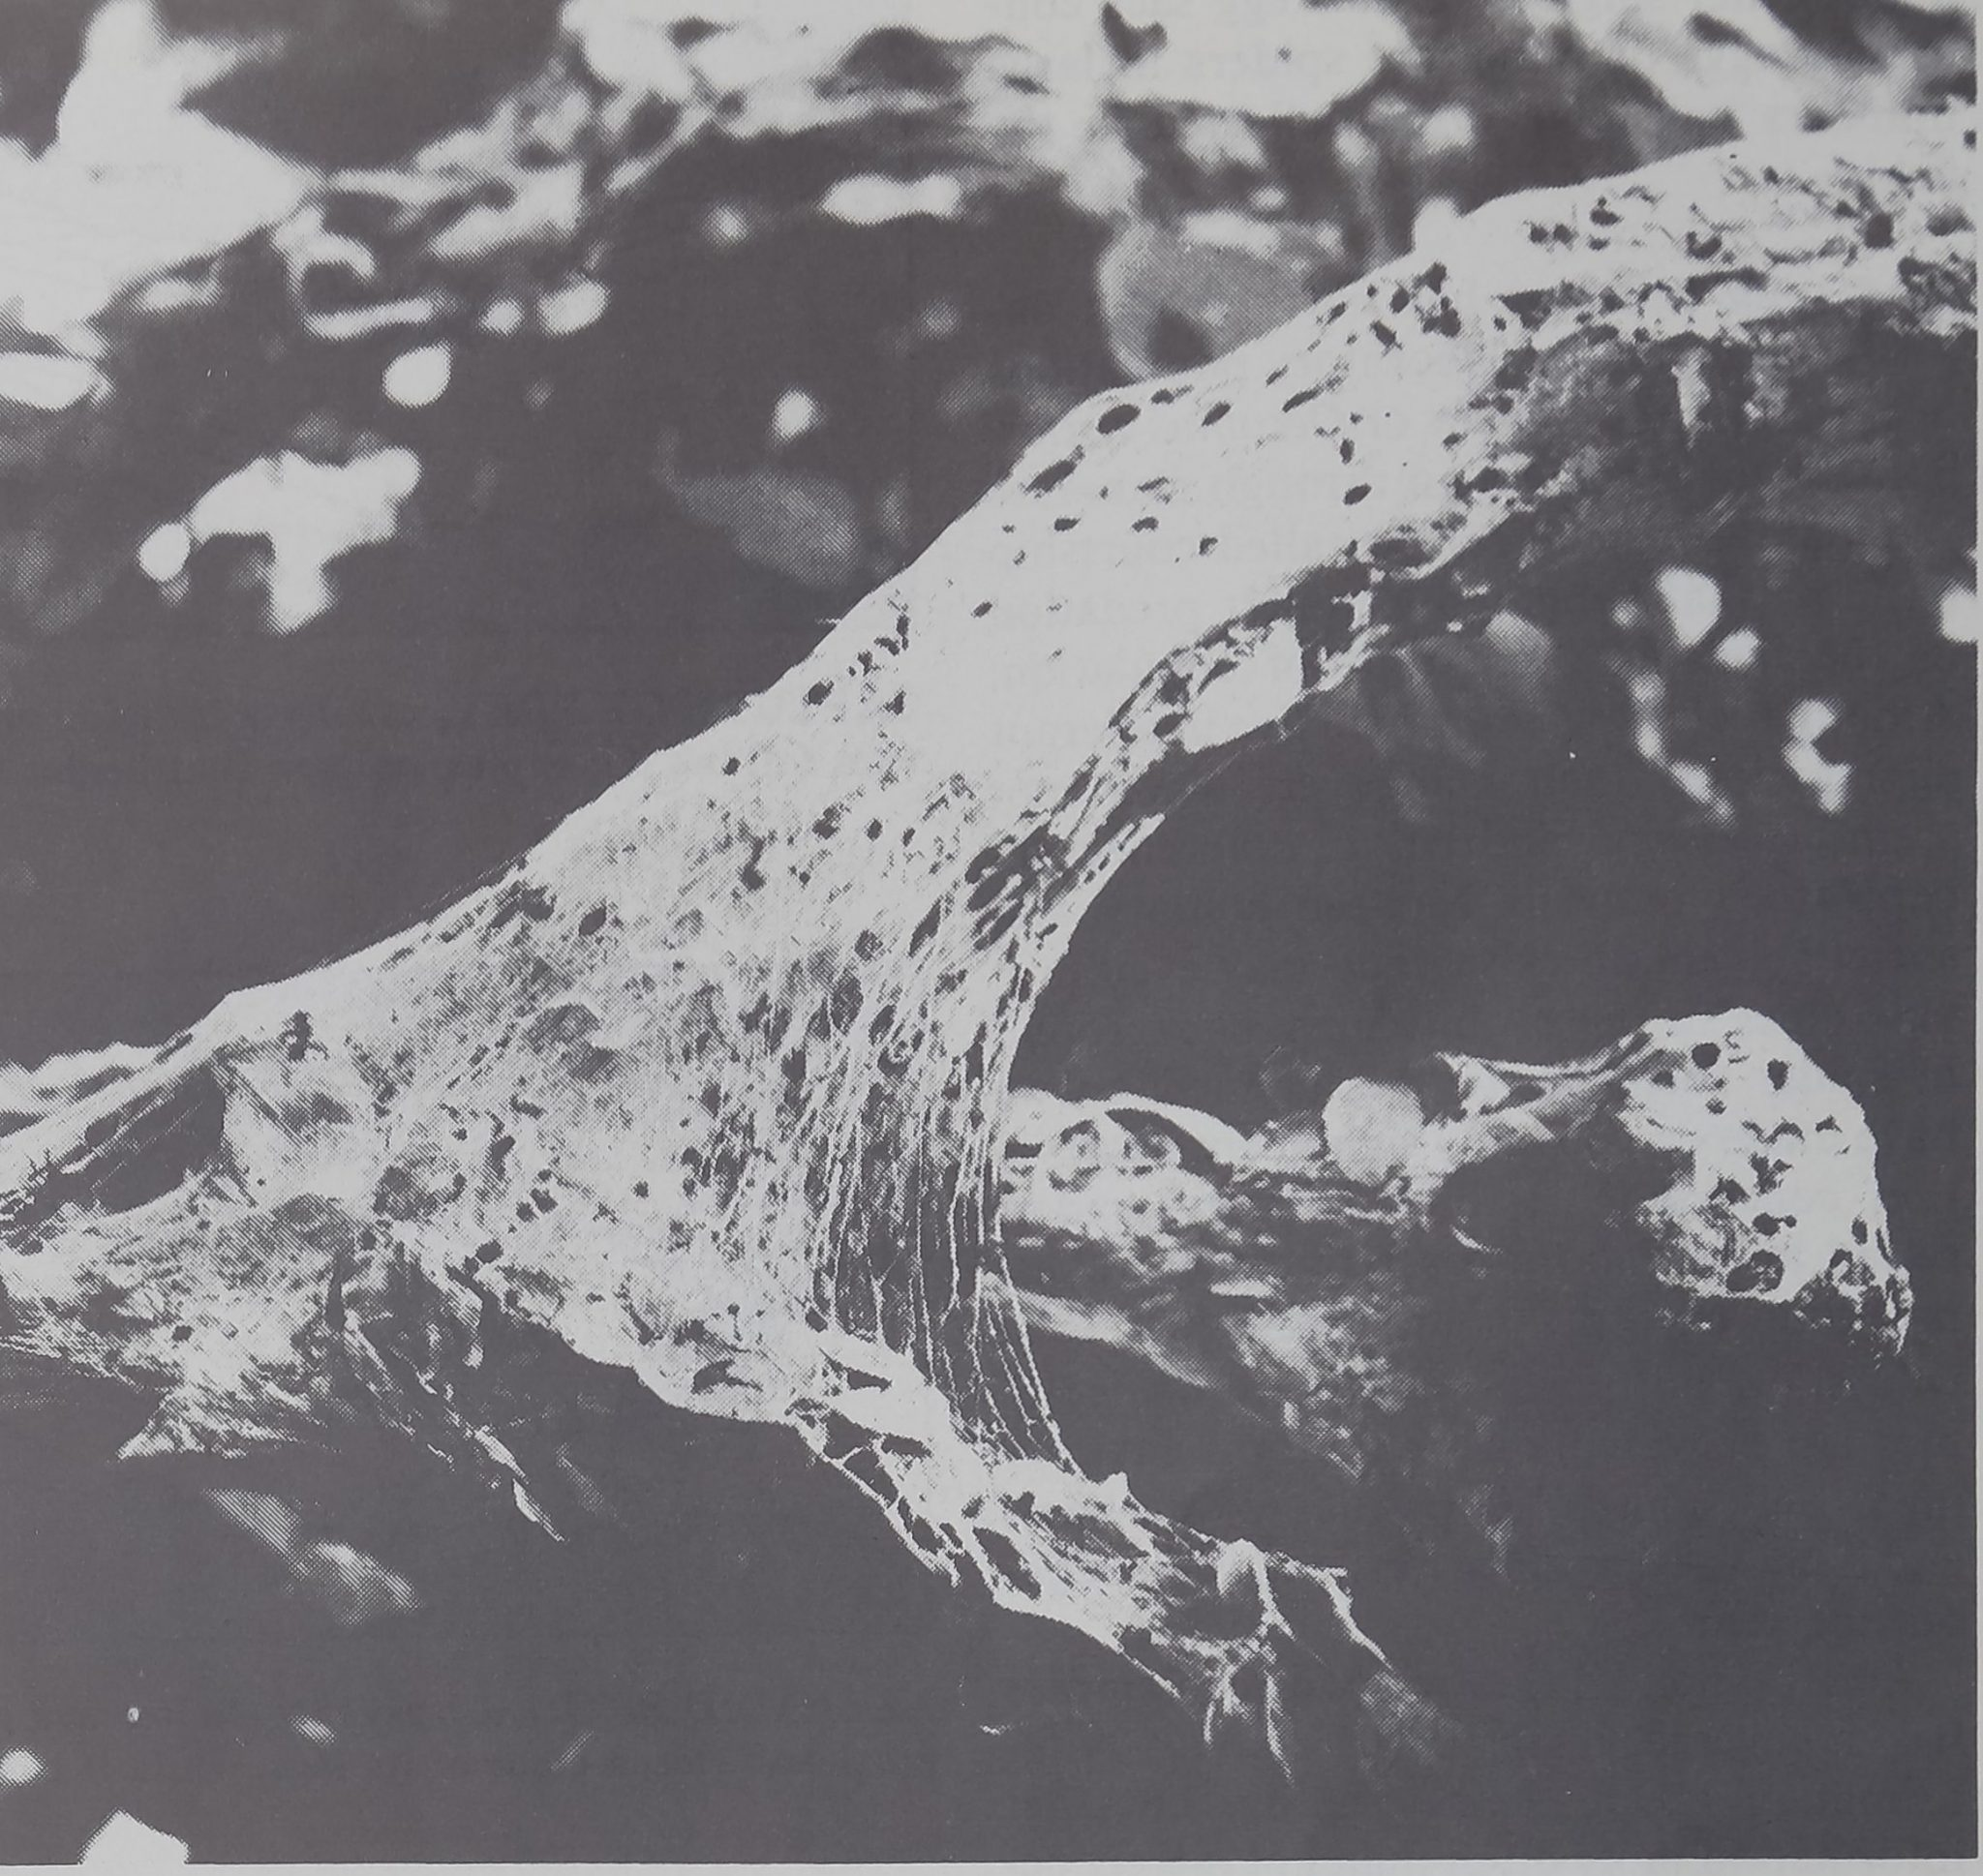 1976-ScientificAmerican-11